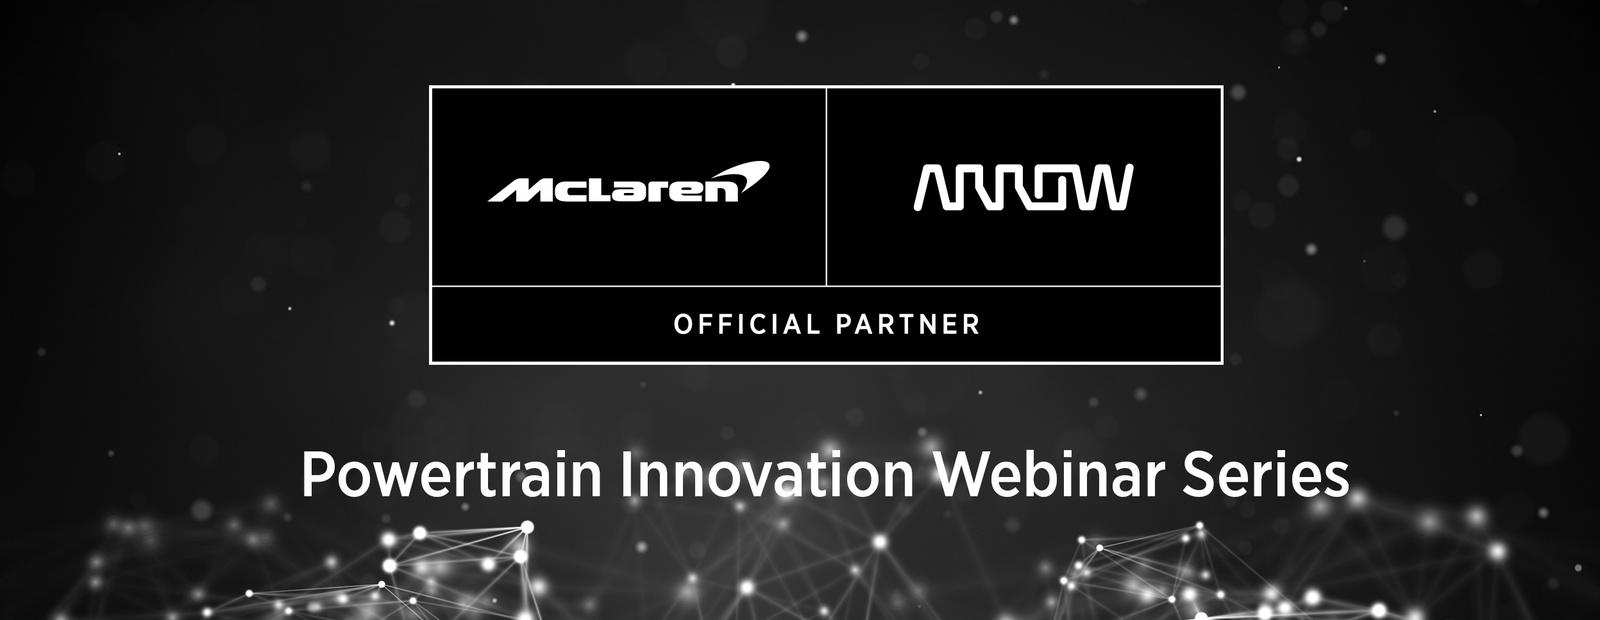 Powertrain Innovation Webinar Series